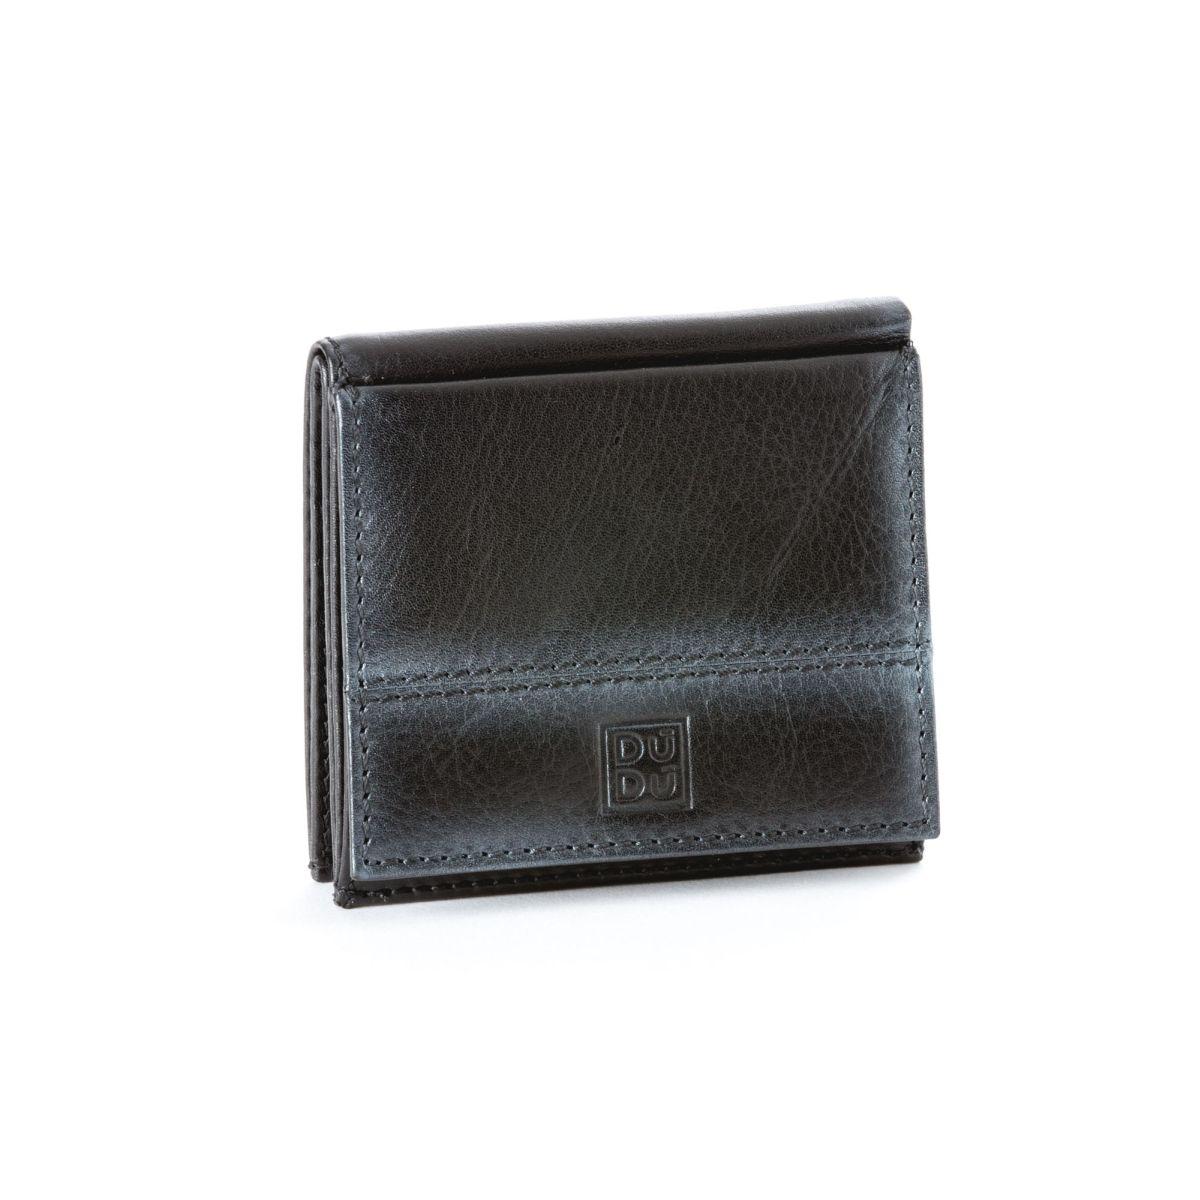 Unique wallet